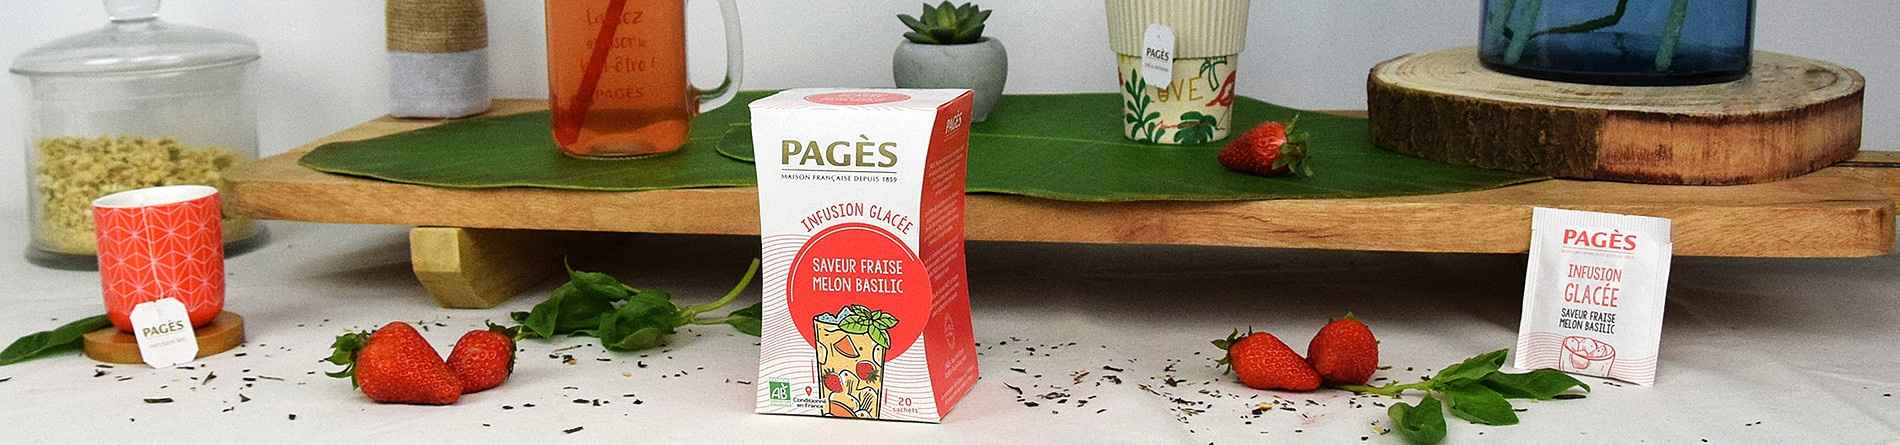 infusion glacée fraise melon basilic bio pages 20 sachets